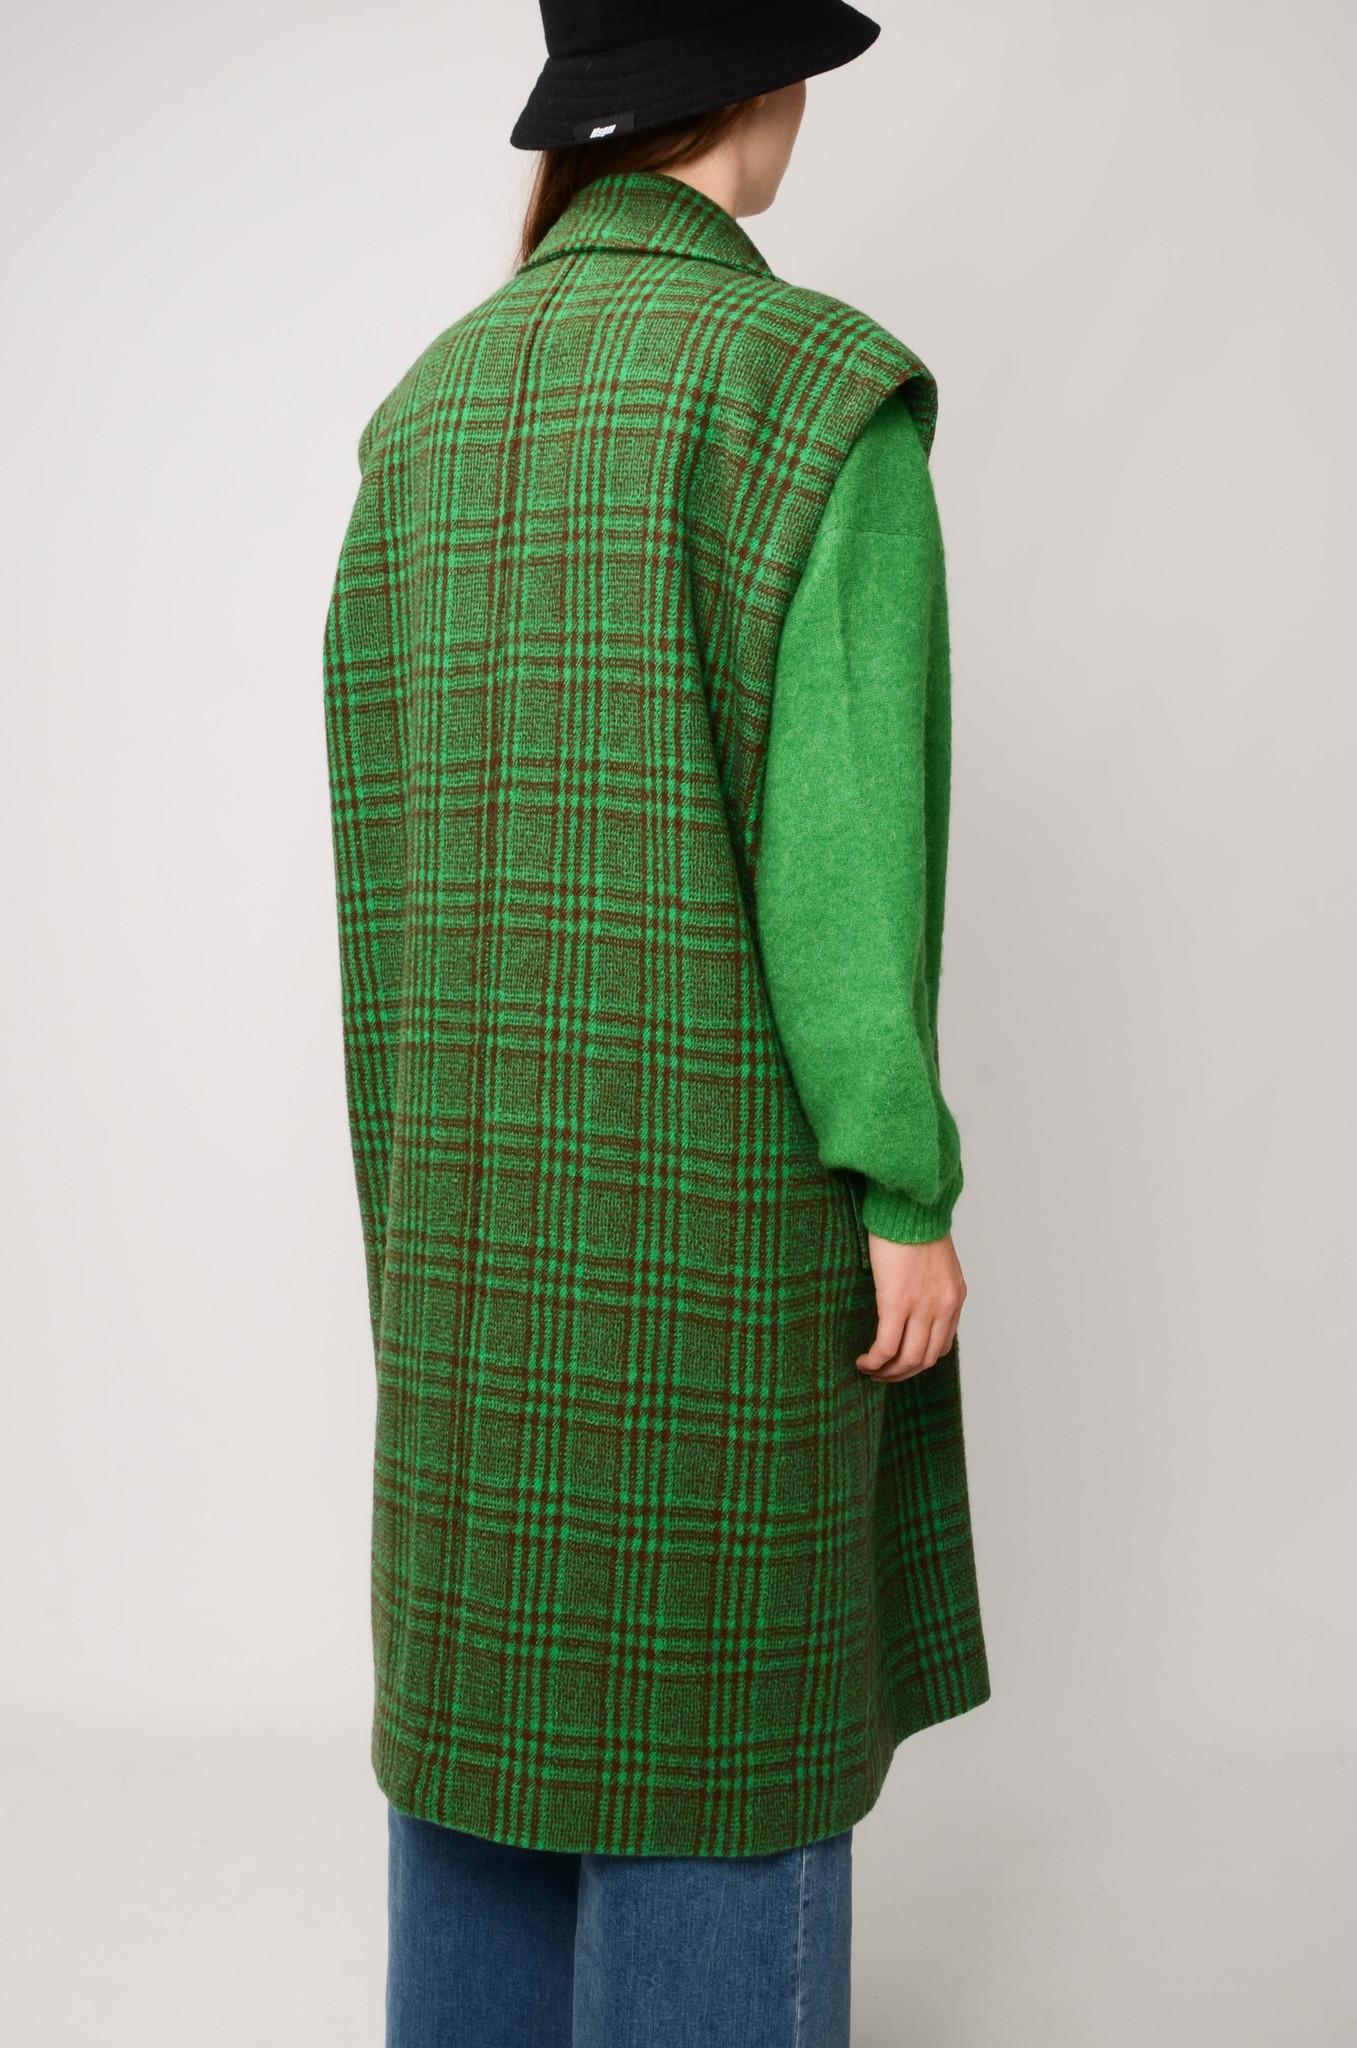 DECKA COAT IN GREEN CHECK-4